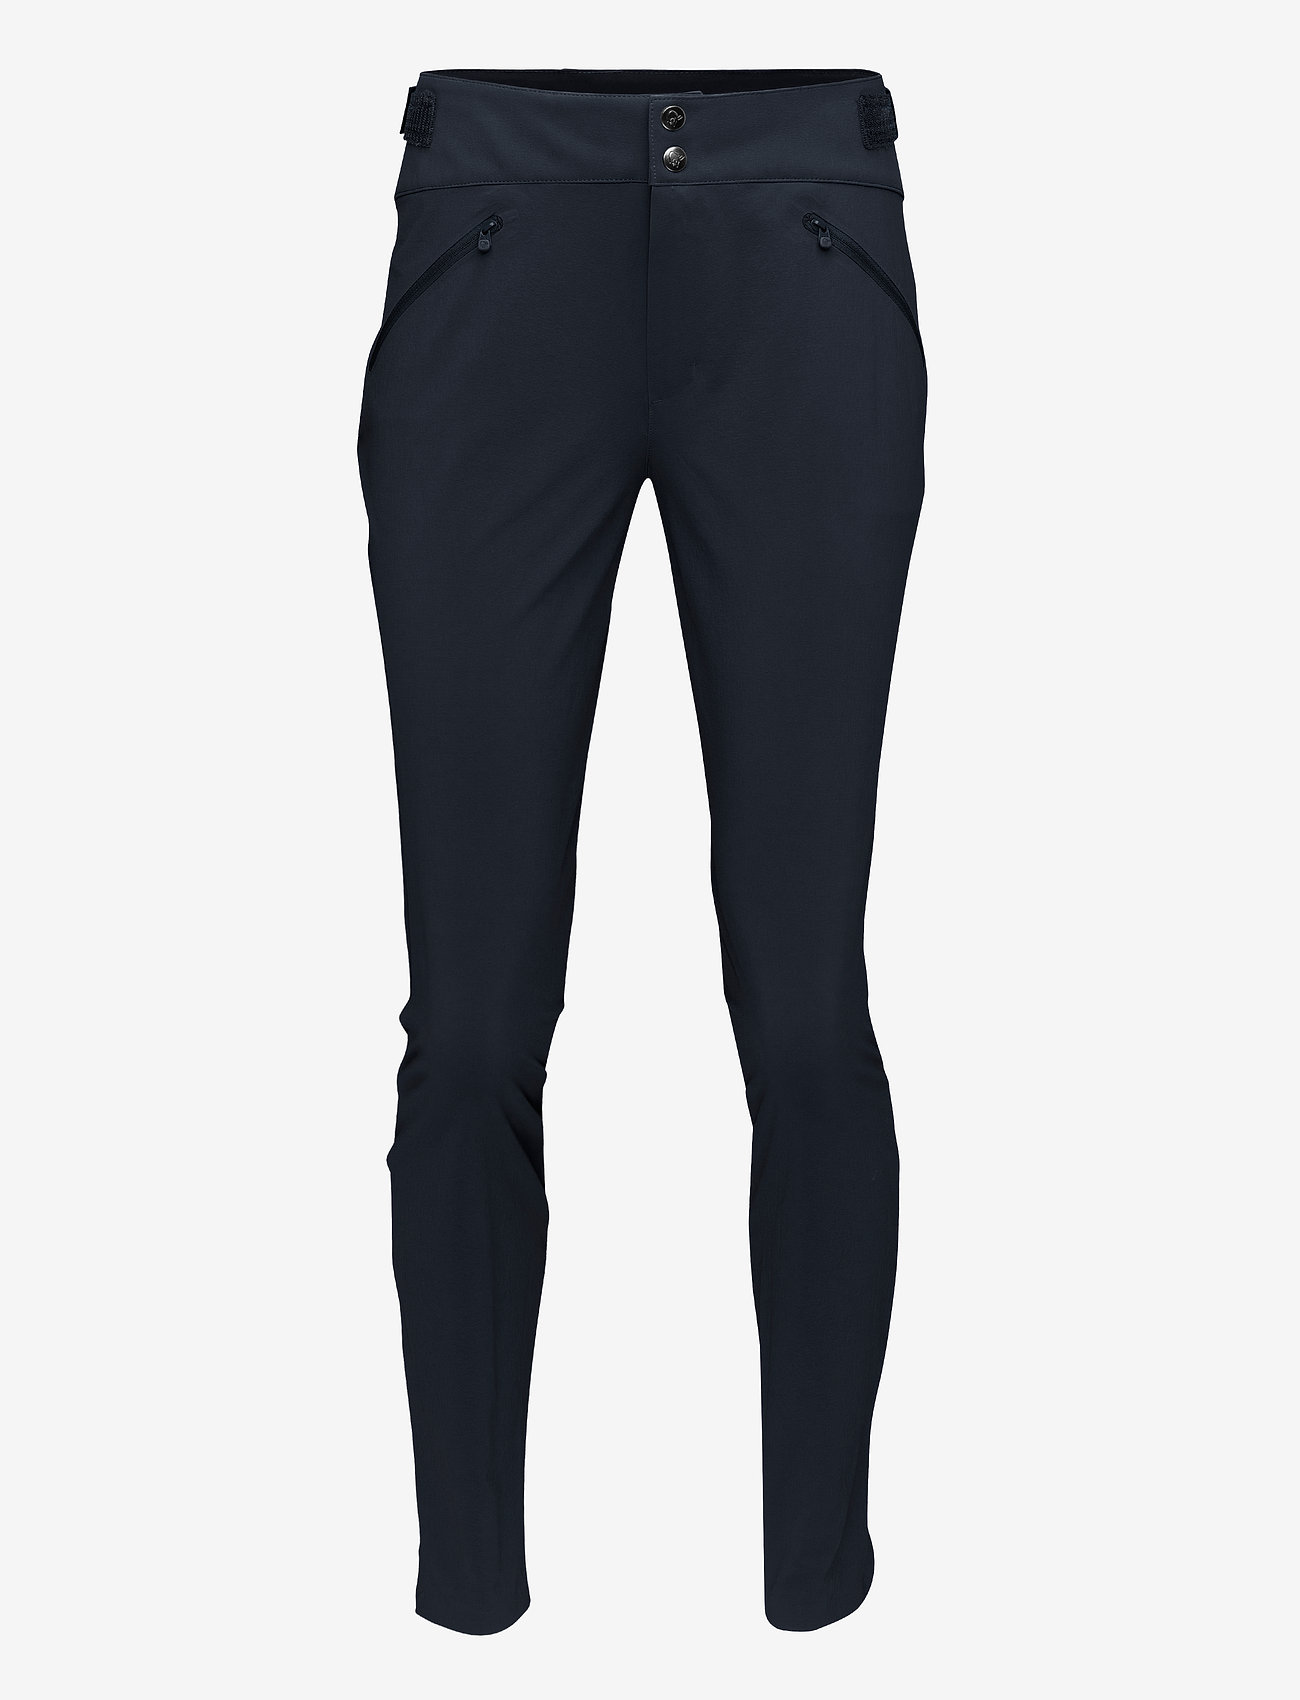 Norrøna - falketind flex1 slim Pants W's - friluftsbukser - caviar - 0